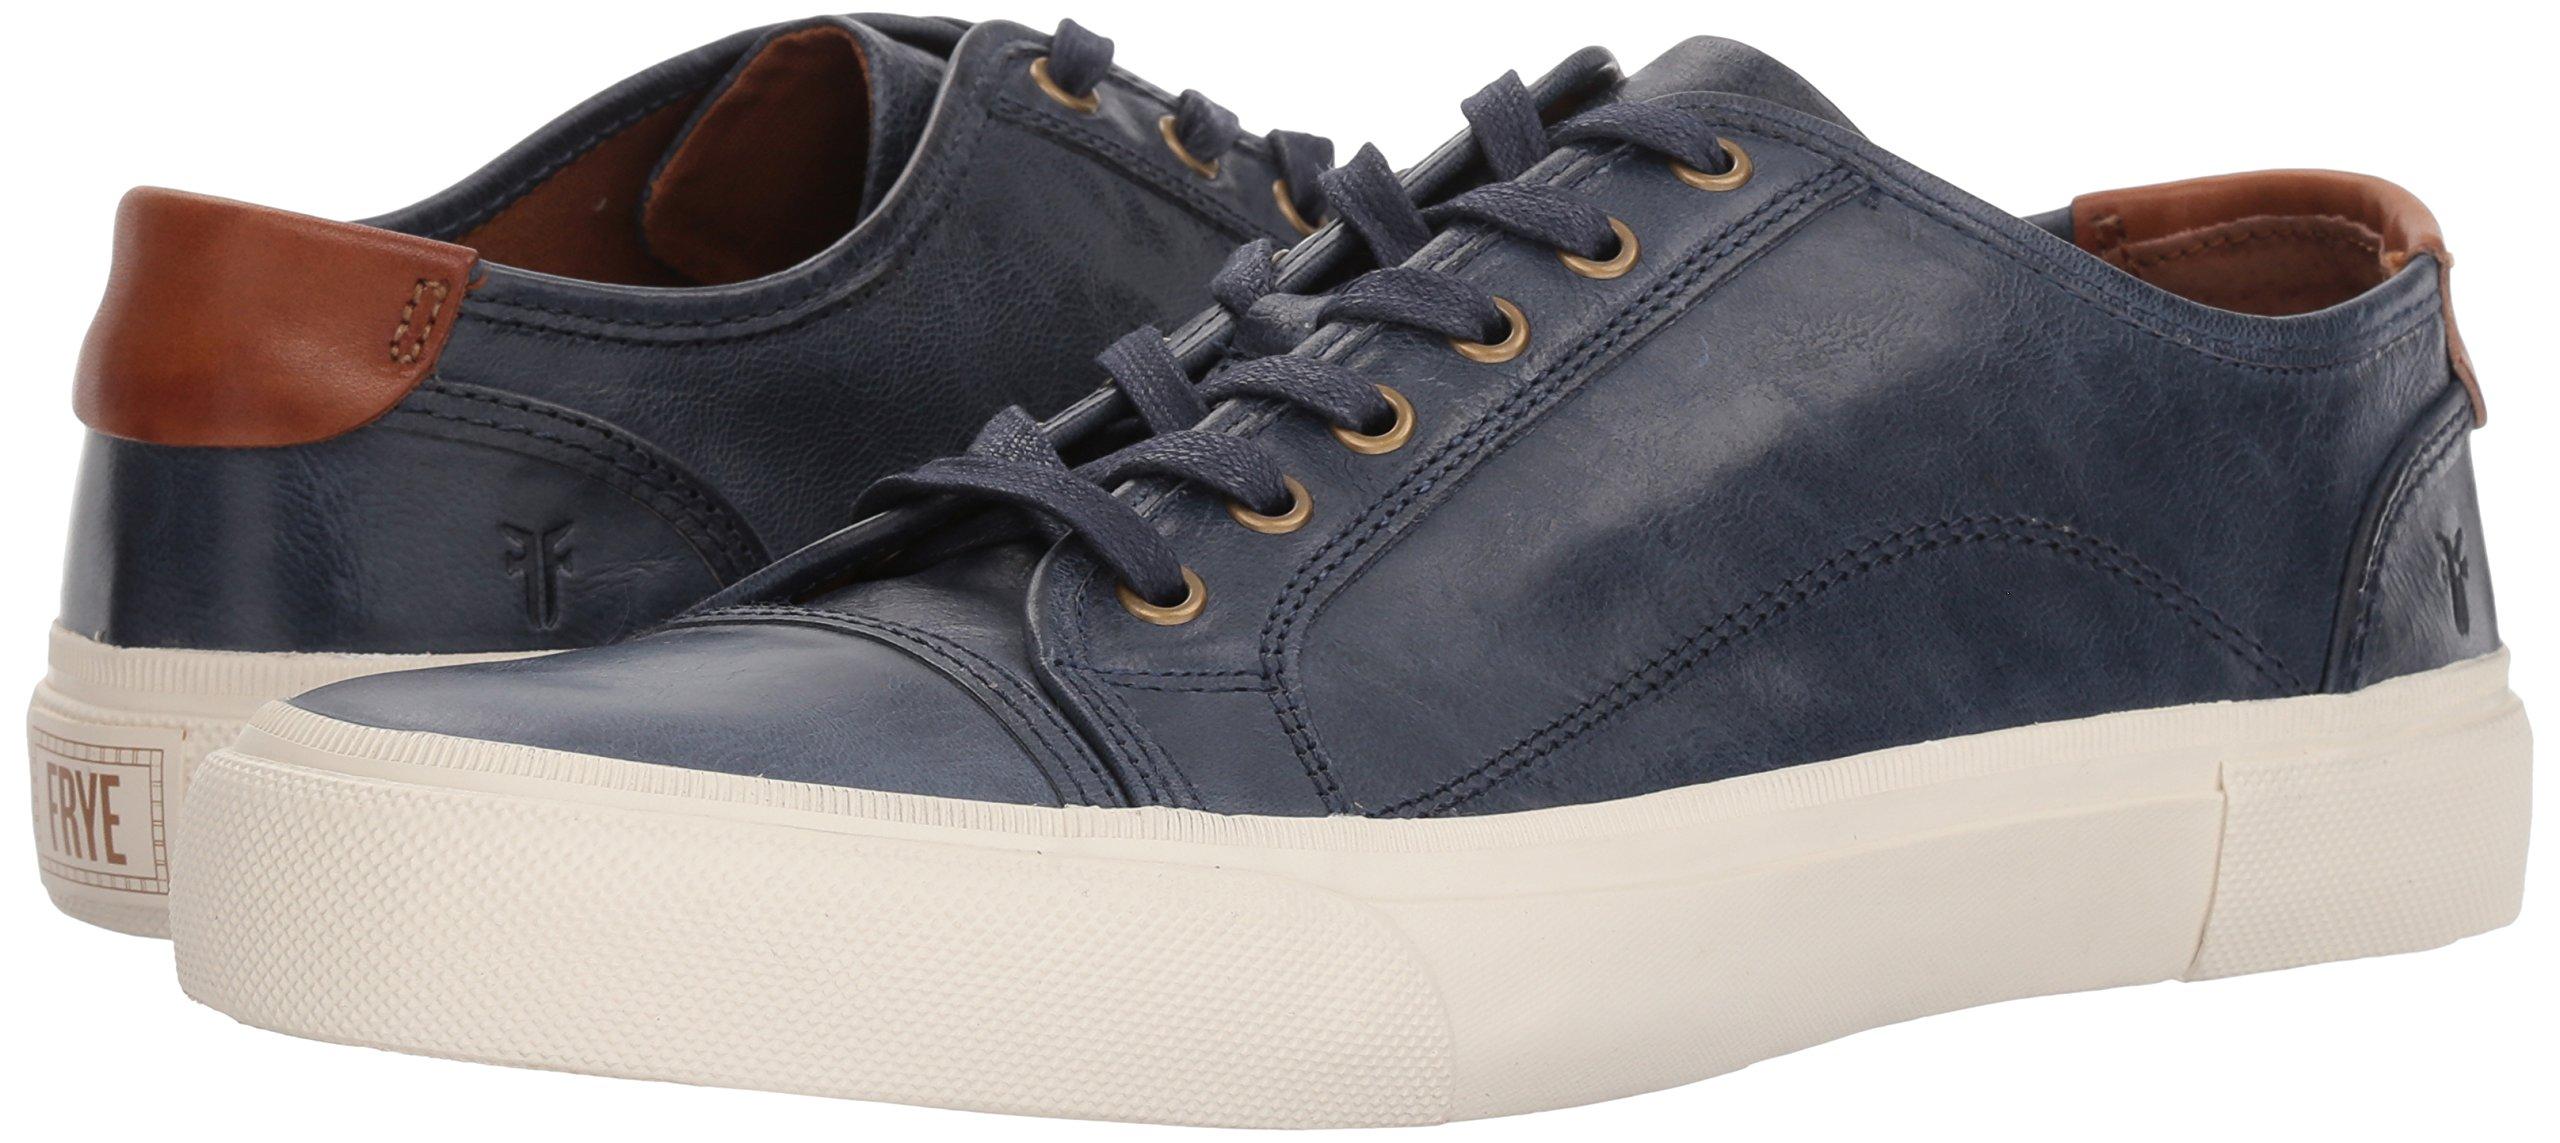 FRYE Men's Ludlow Cap Lowlace Sneaker, Navy, 11 Medium US by FRYE (Image #6)